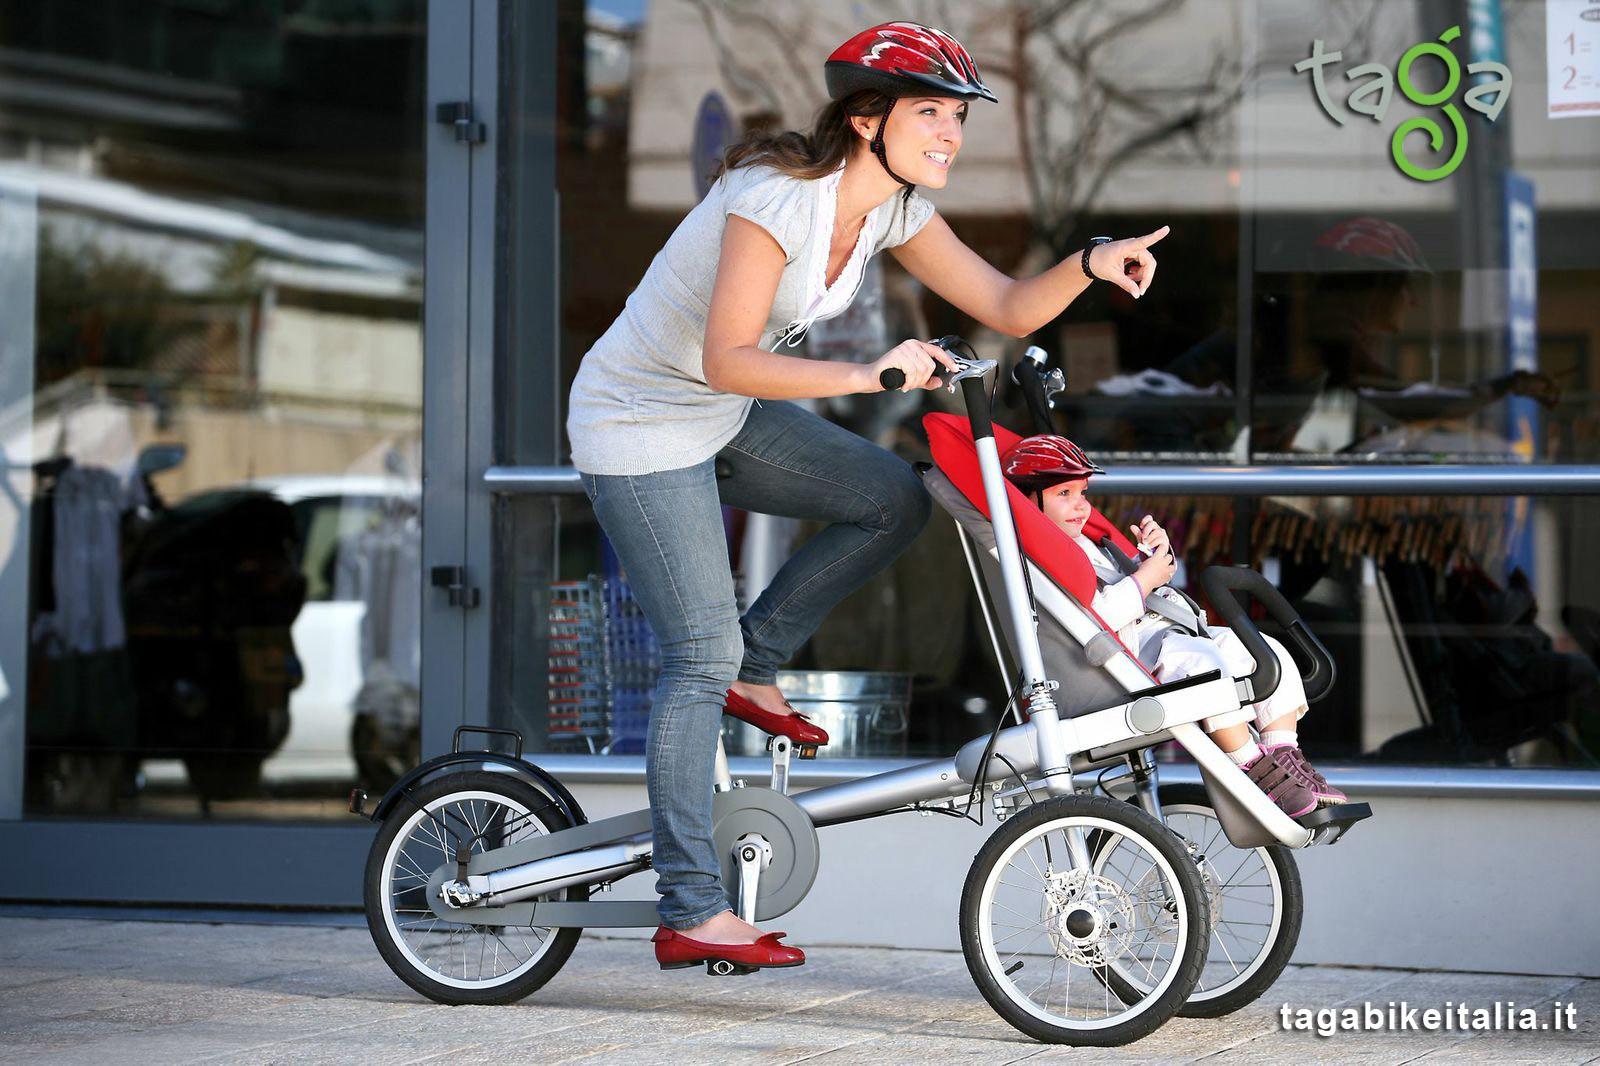 portare bambini in bici in sicurezza